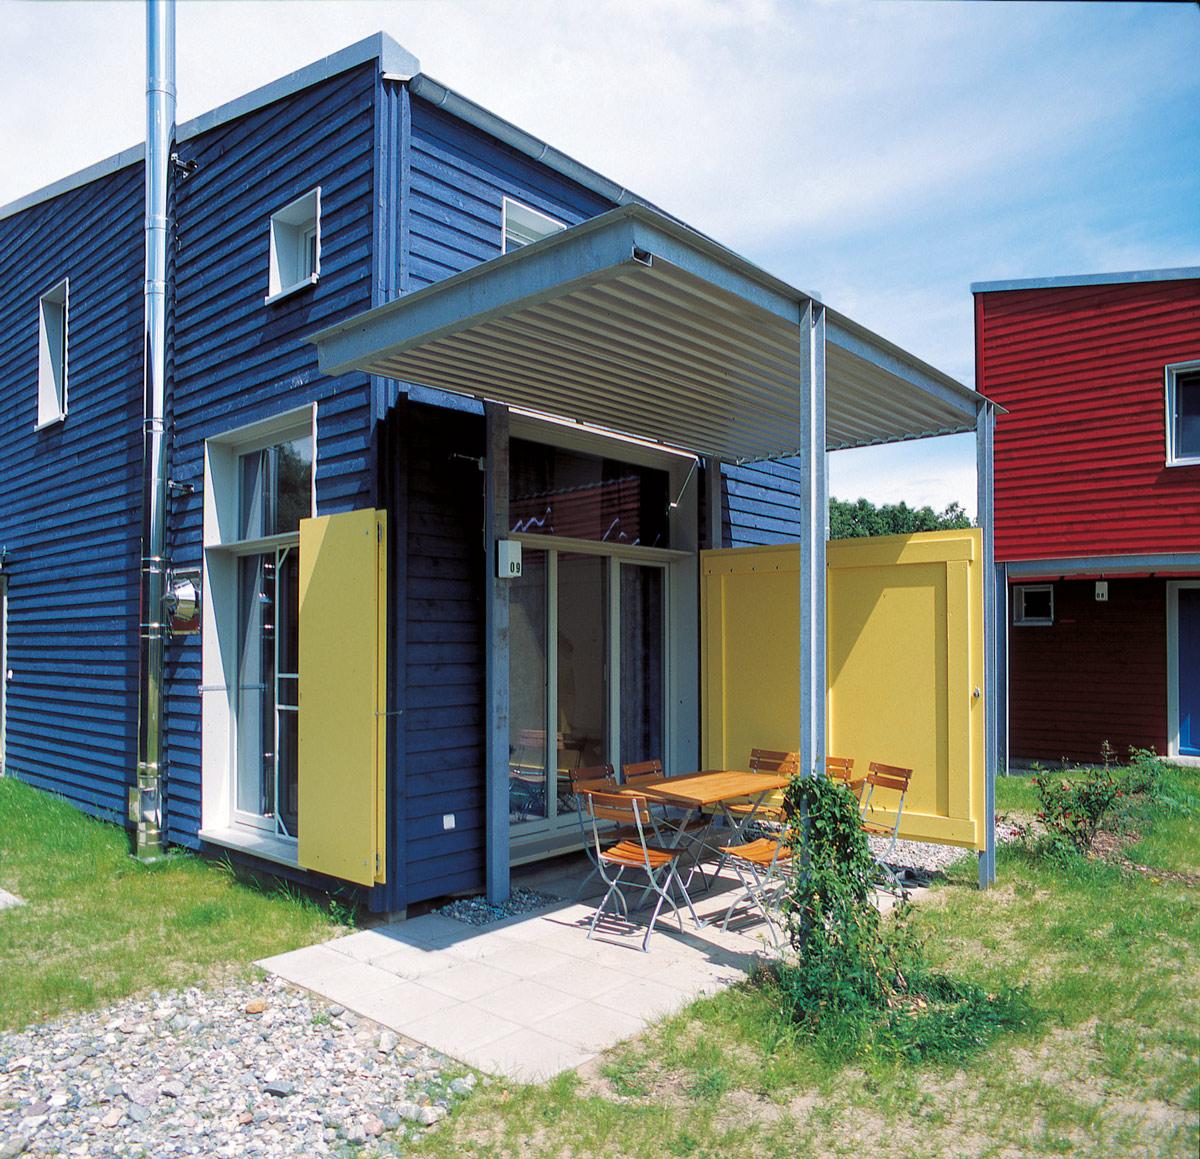 ferienh user schindler architekten. Black Bedroom Furniture Sets. Home Design Ideas